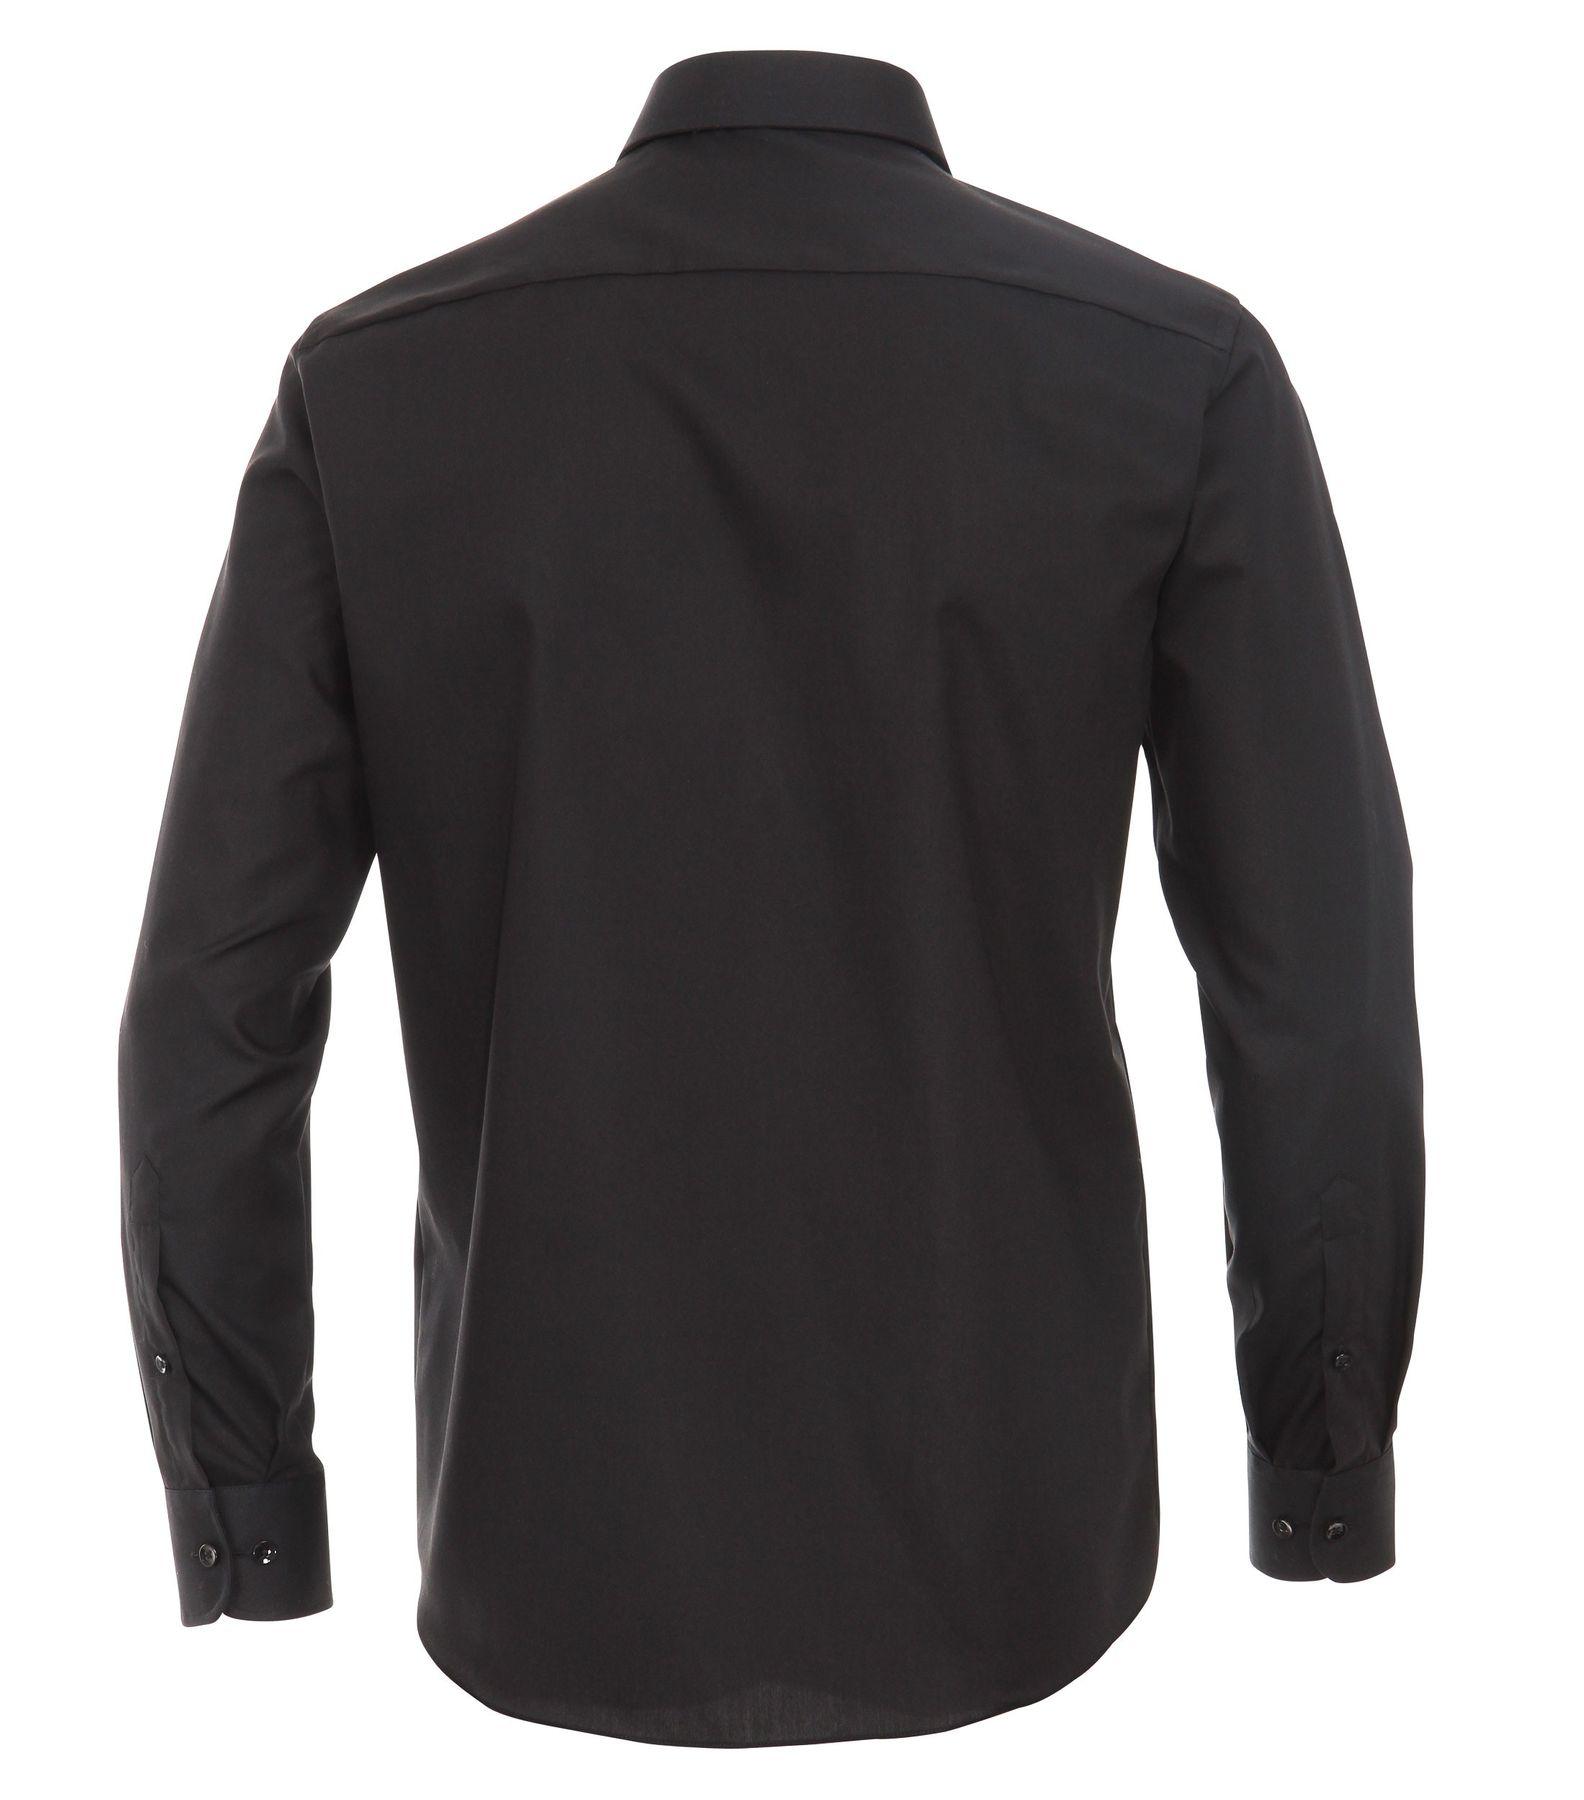 Casa Moda - Modern Fit - Bügelfreies Herren Business langarm Hemd in verschiedene Farben (006550) – Bild 22